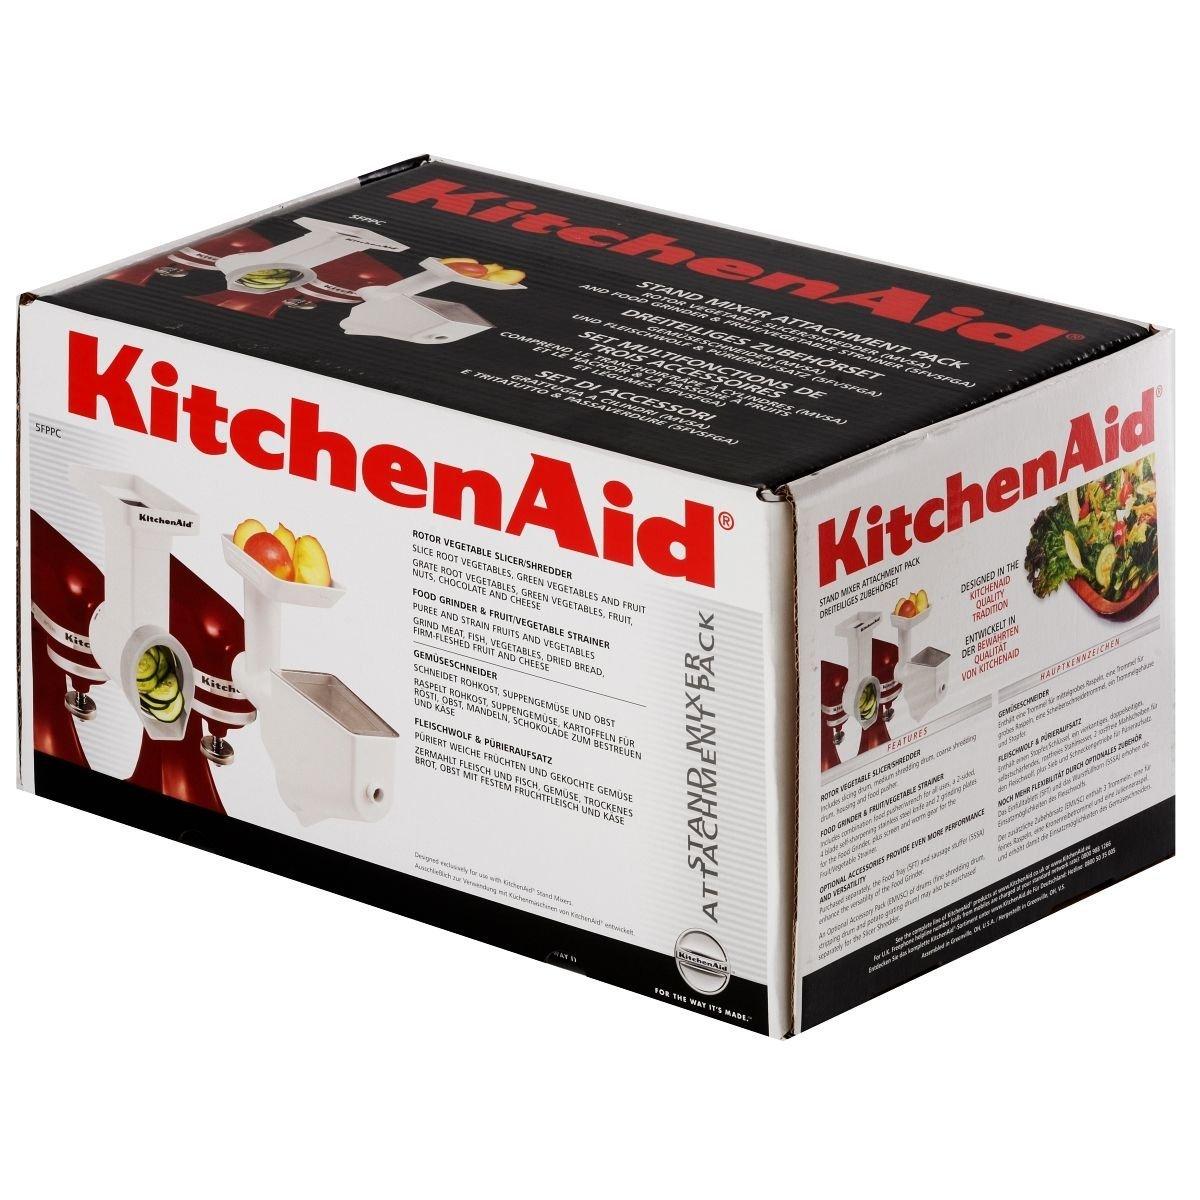 Набор насадок: мясорубка, протирка, овощерезка KitchenAid, белый KitchenAid FPPC фото 2